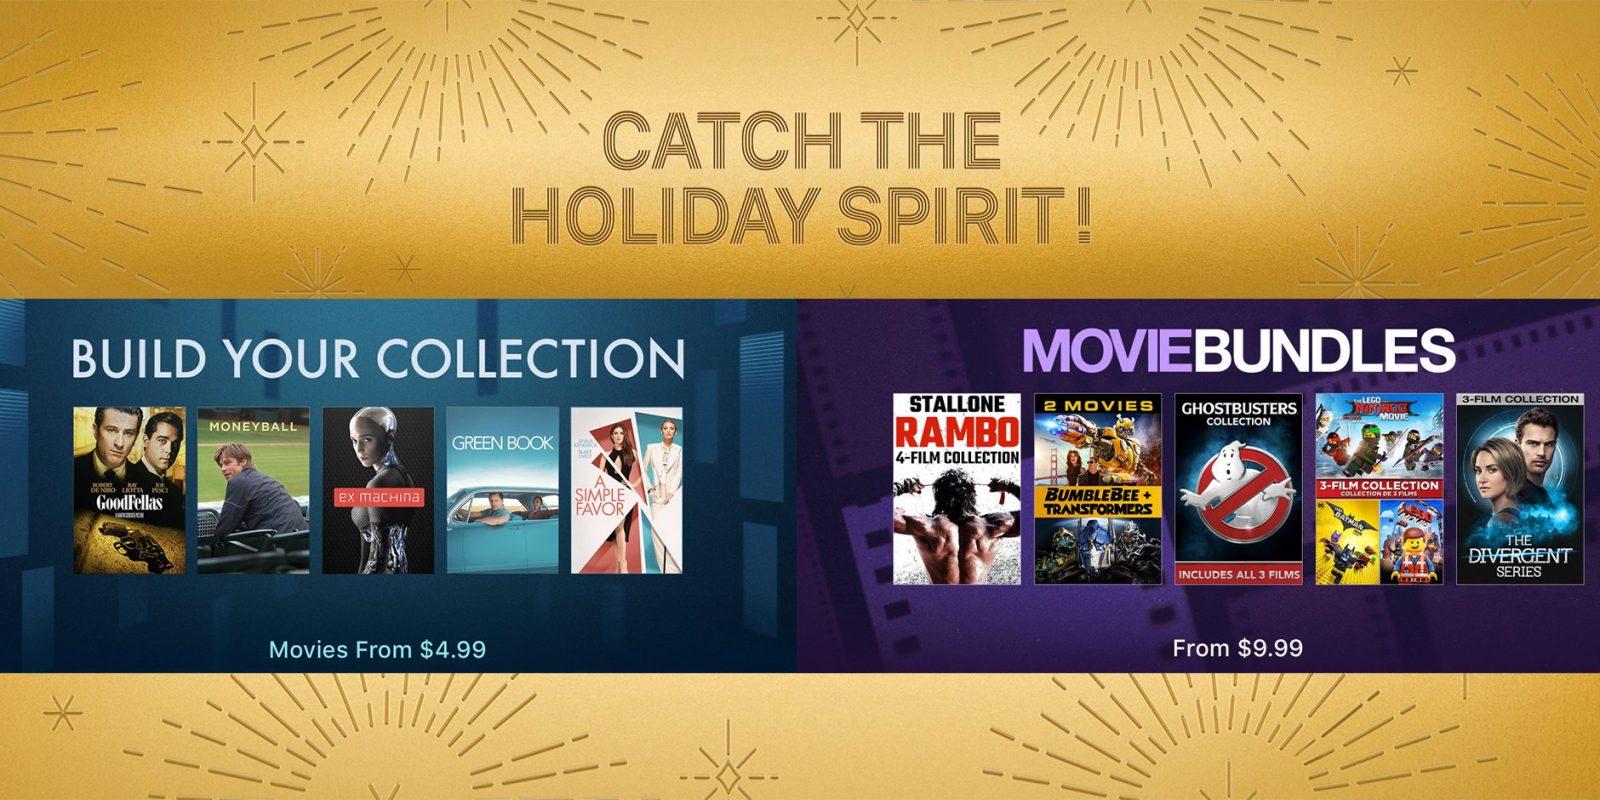 Apple Black Friday movie sale now live from $4: Bundles start at $8, 4K films $5, more